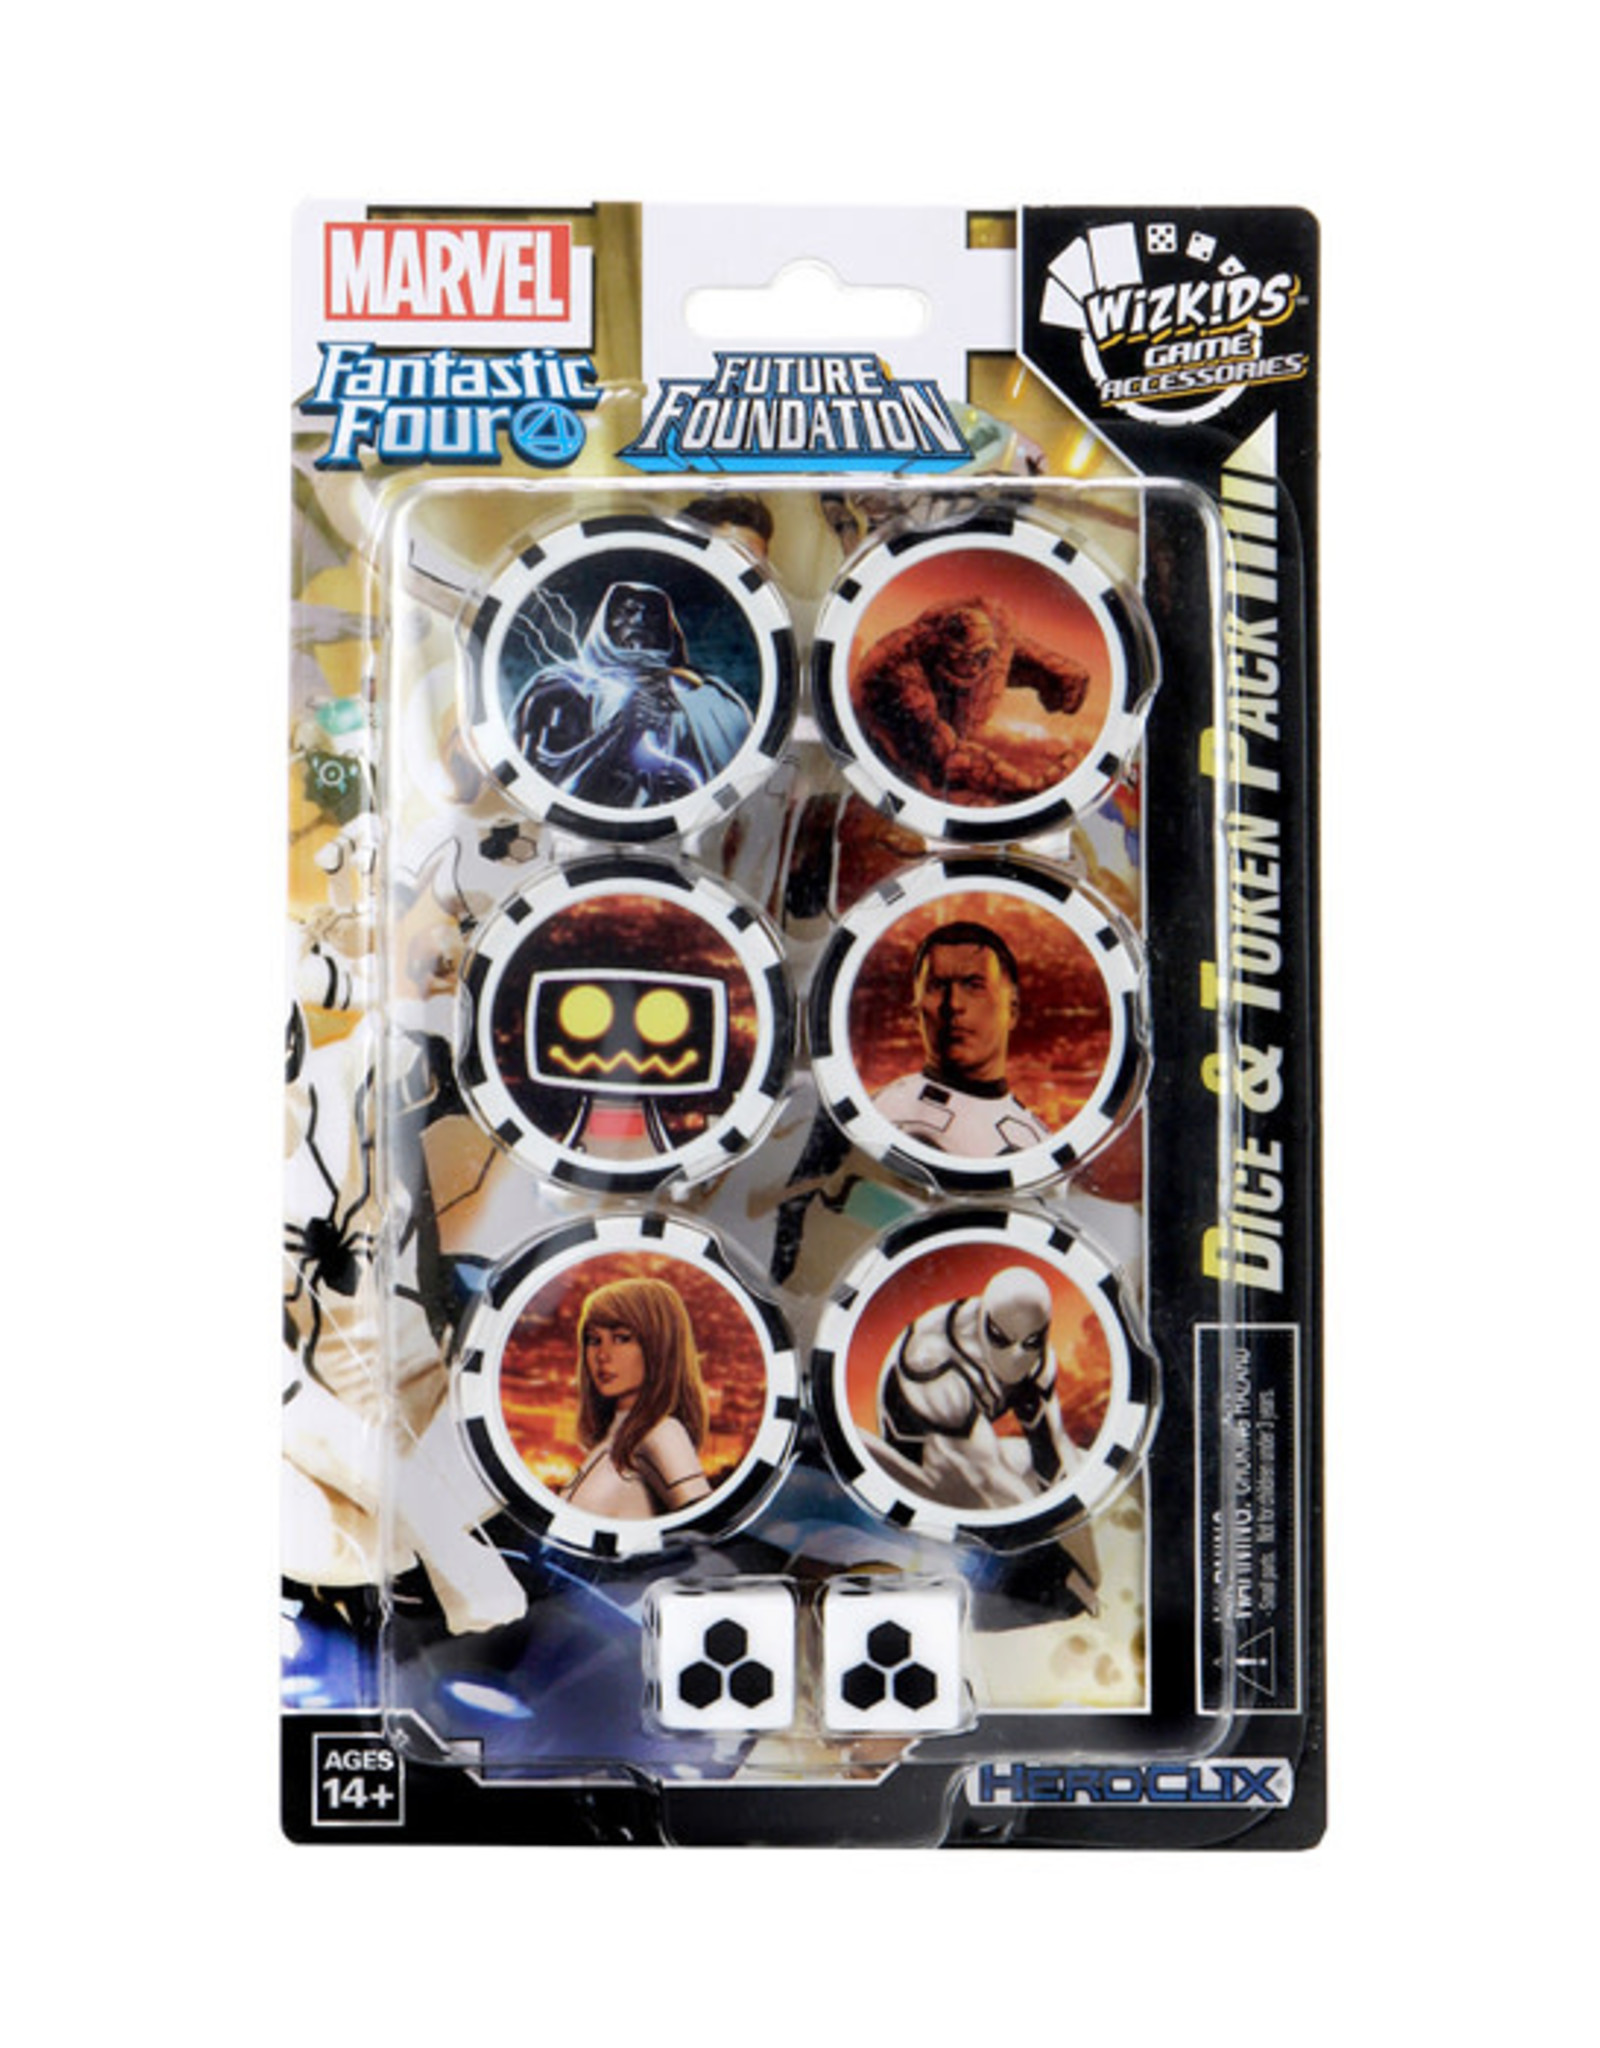 HeroClix HeroClix: Fantastic Four - Future Foundation - Dice & Token Pack